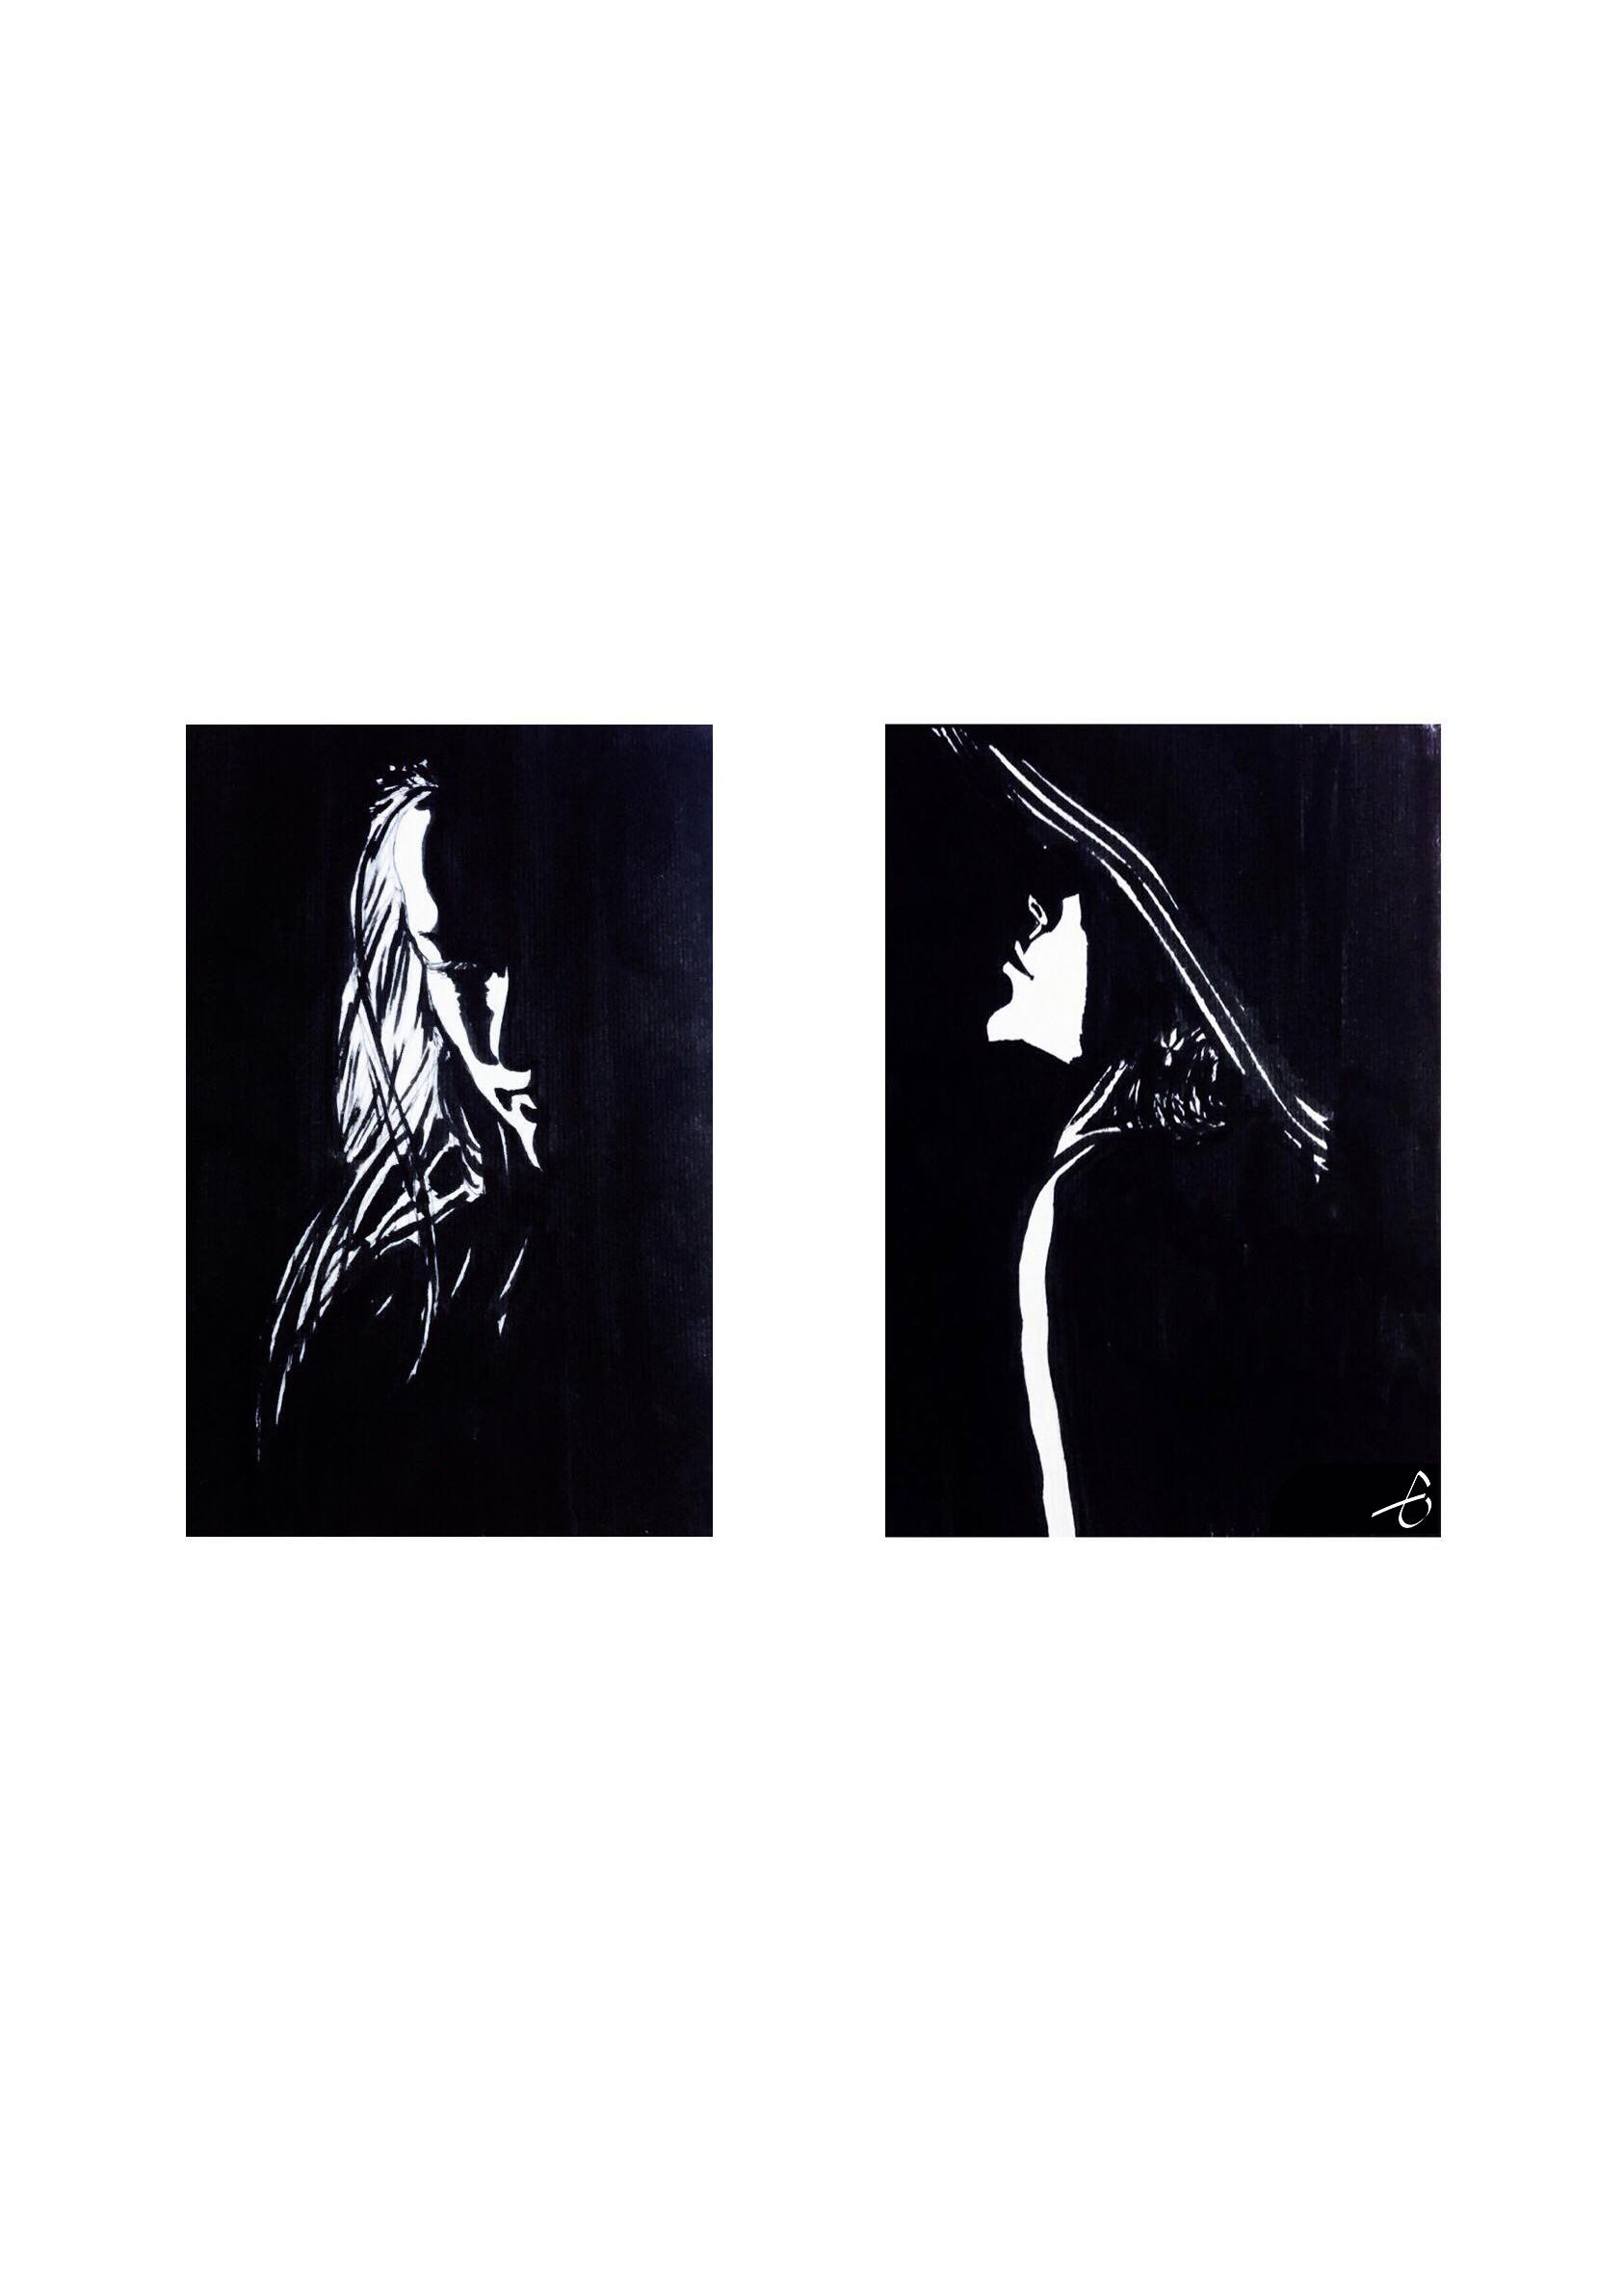 ISMENE & ANTIGONE